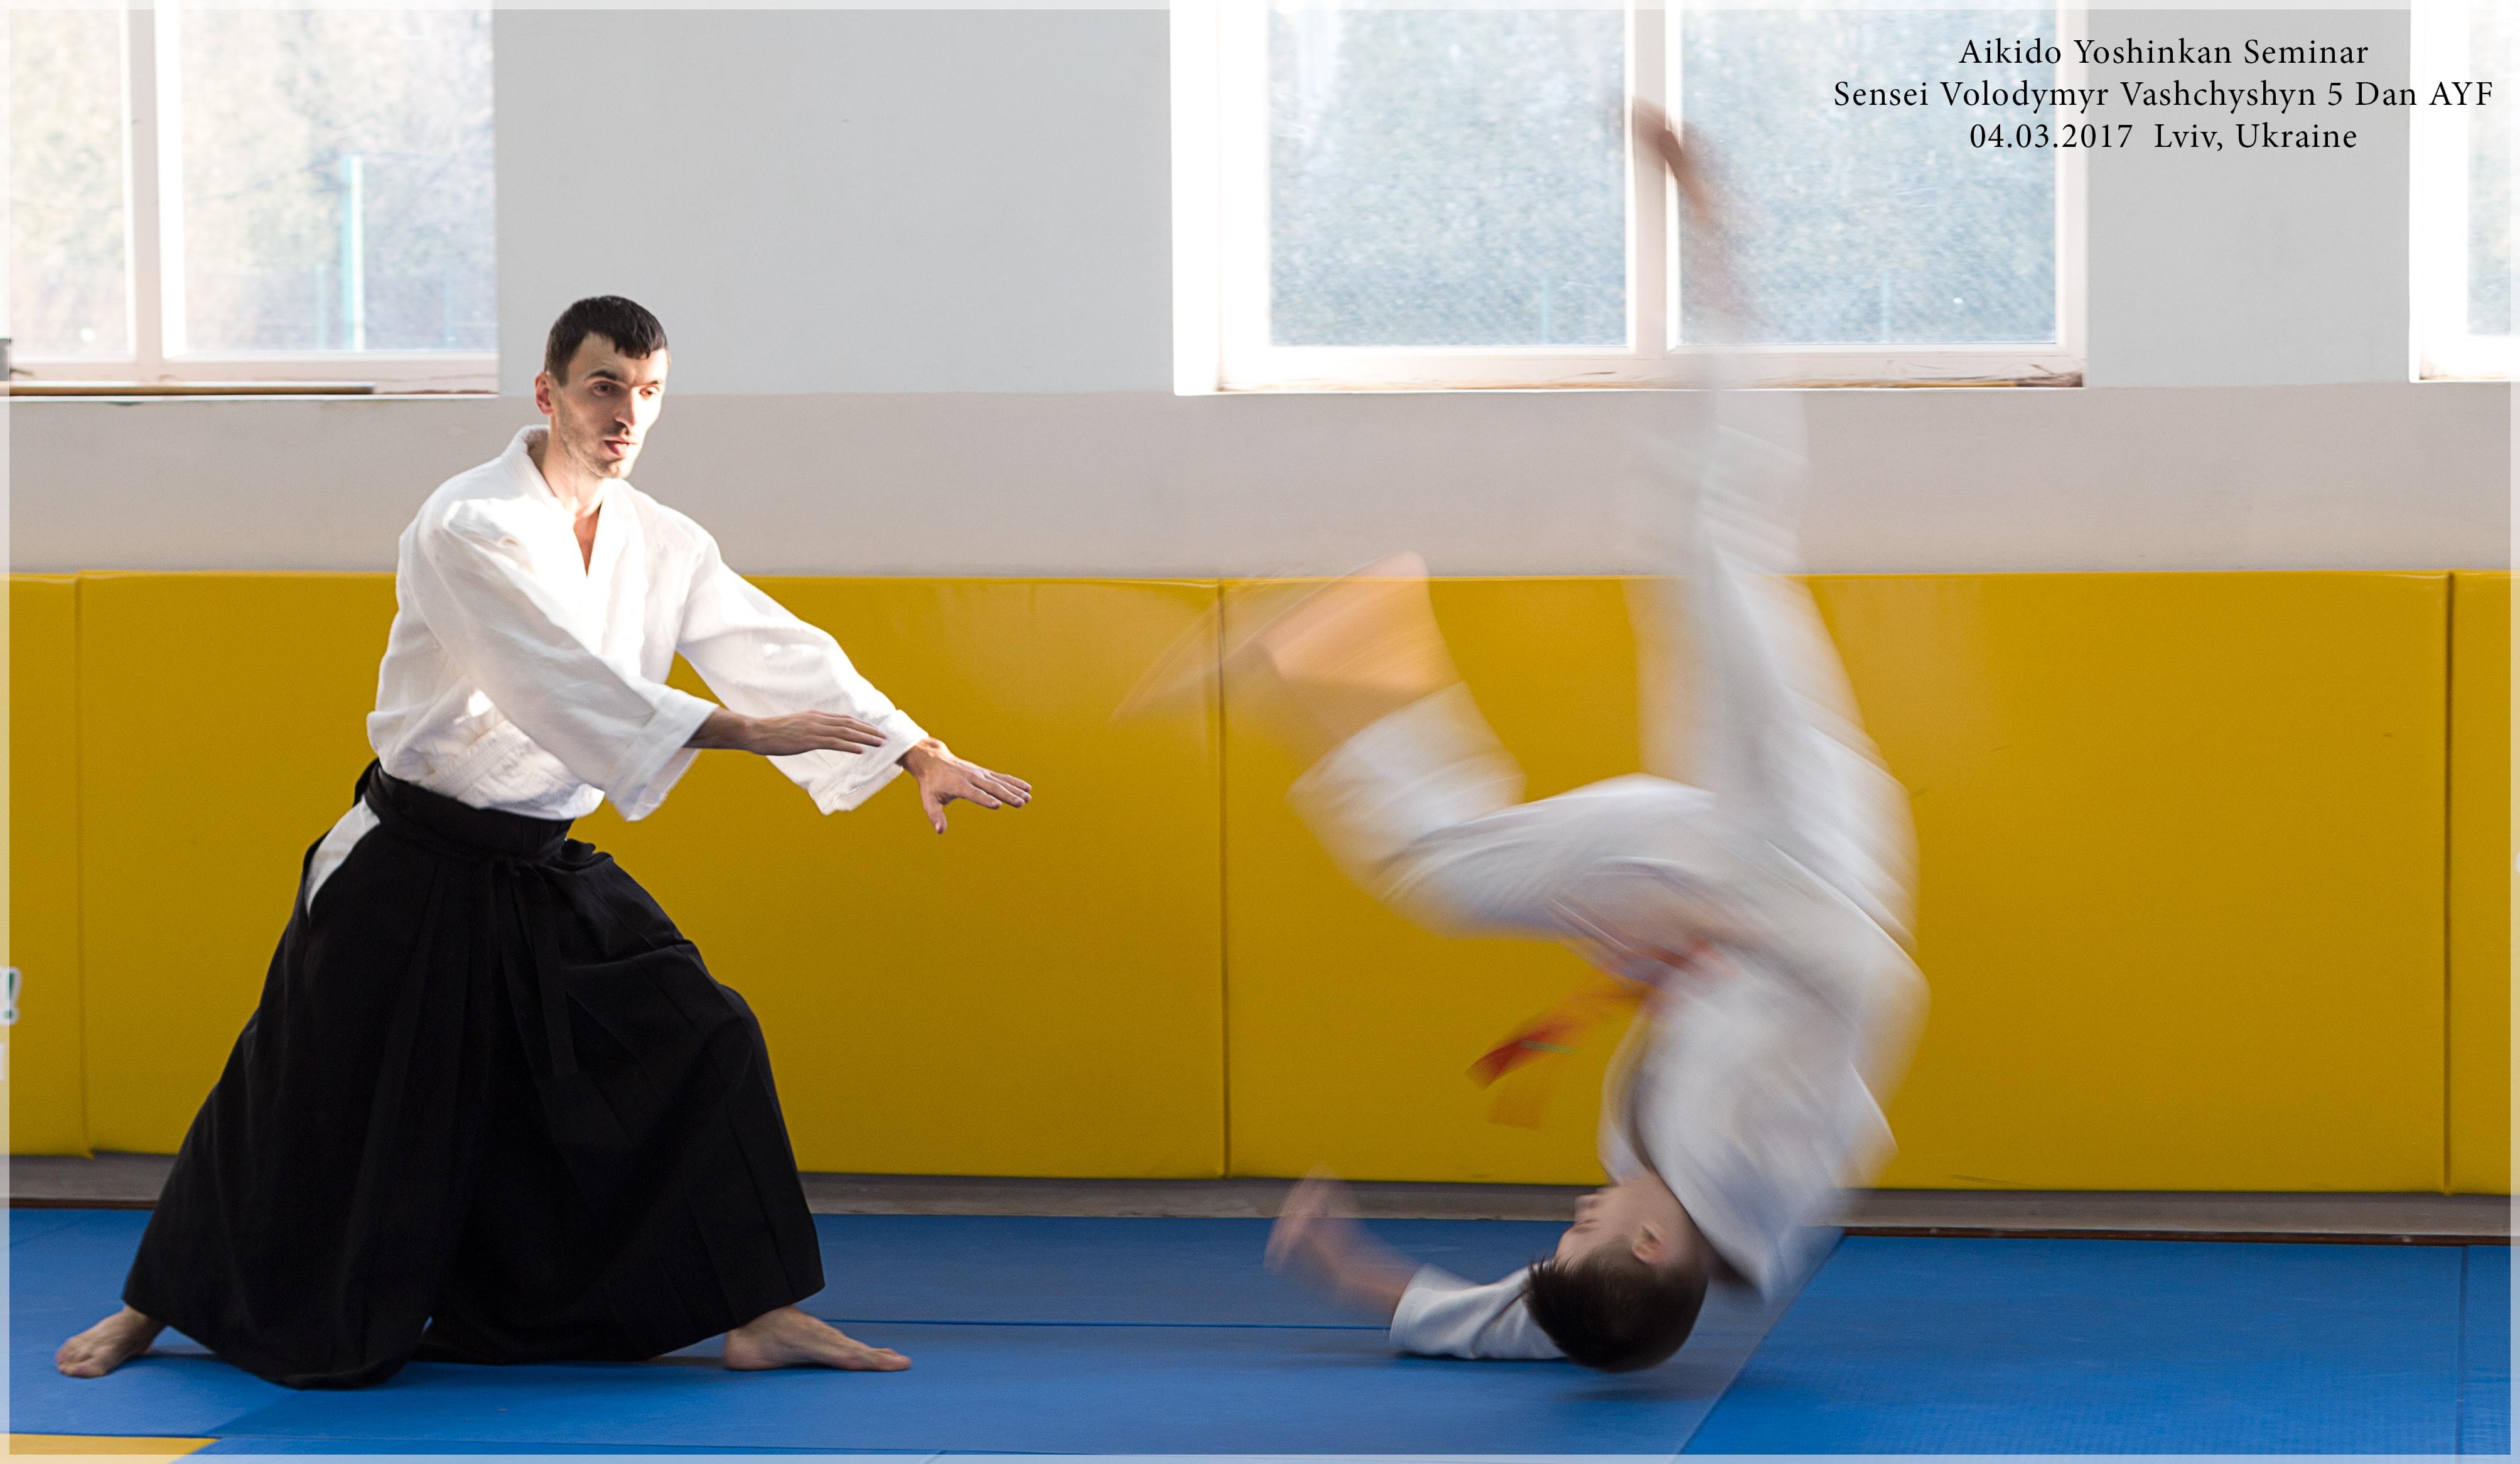 10 айкидо-семинар-киев-львов-спортивная-секция-min